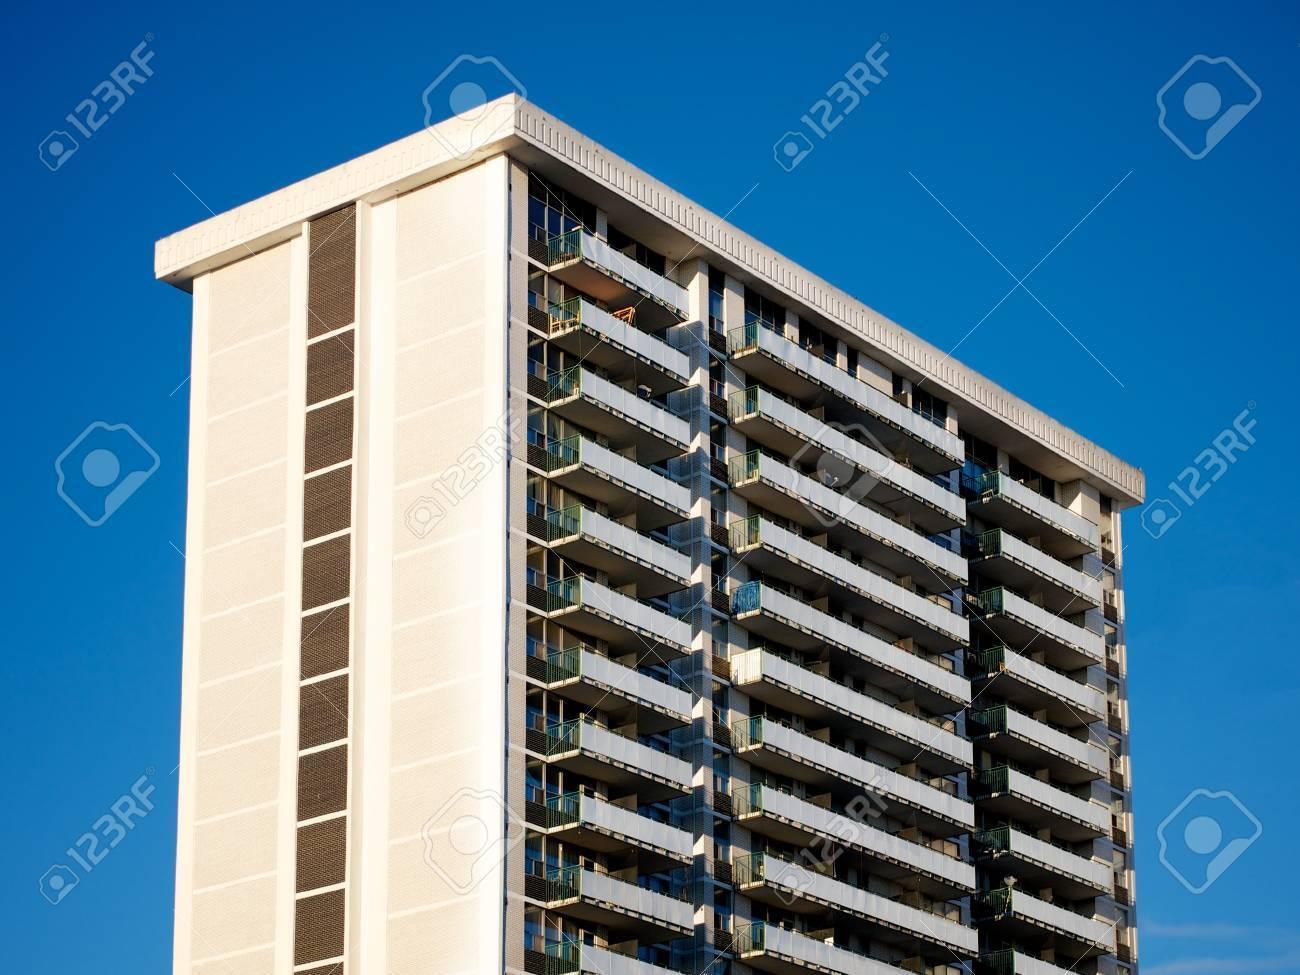 https://previews.123rf.com/images/canadapanda/canadapanda1304/canadapanda130400001/19032917-un-immeuble-des-ann%C3%A9es-80-le-jour-de-ciel-bleu-.jpg